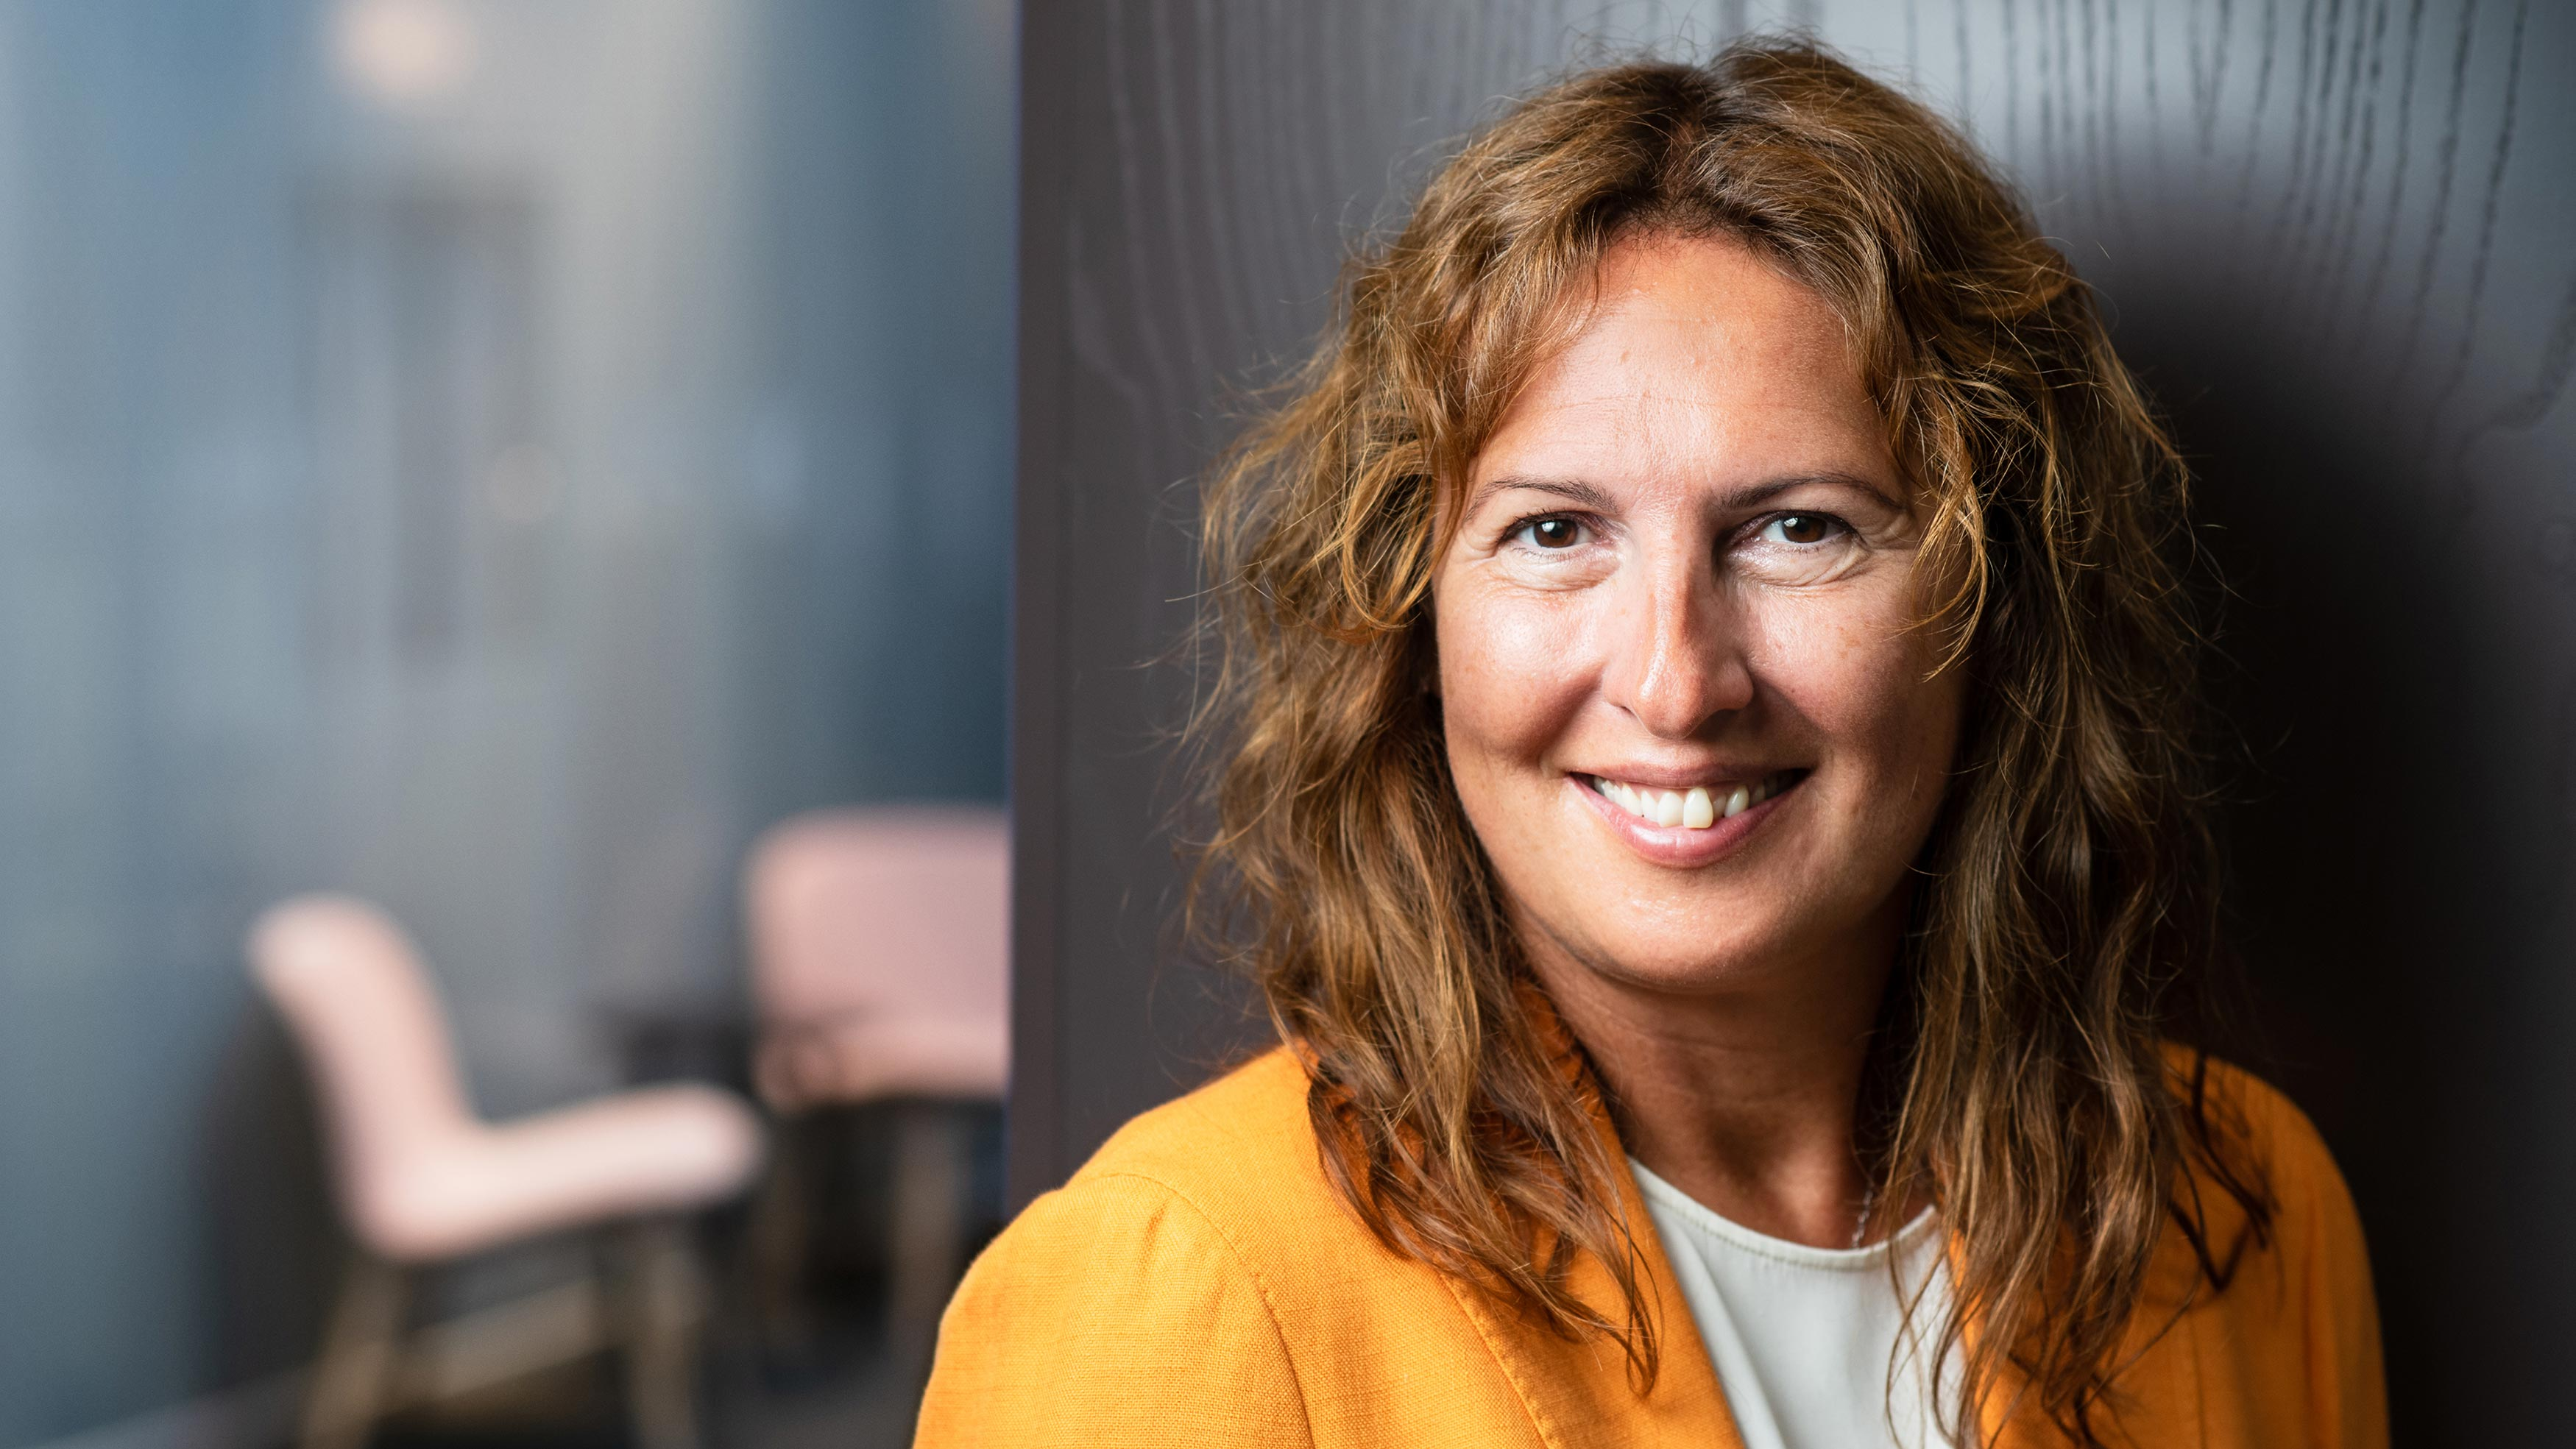 Image of Kungsleden CEO Biljana Pehrsson